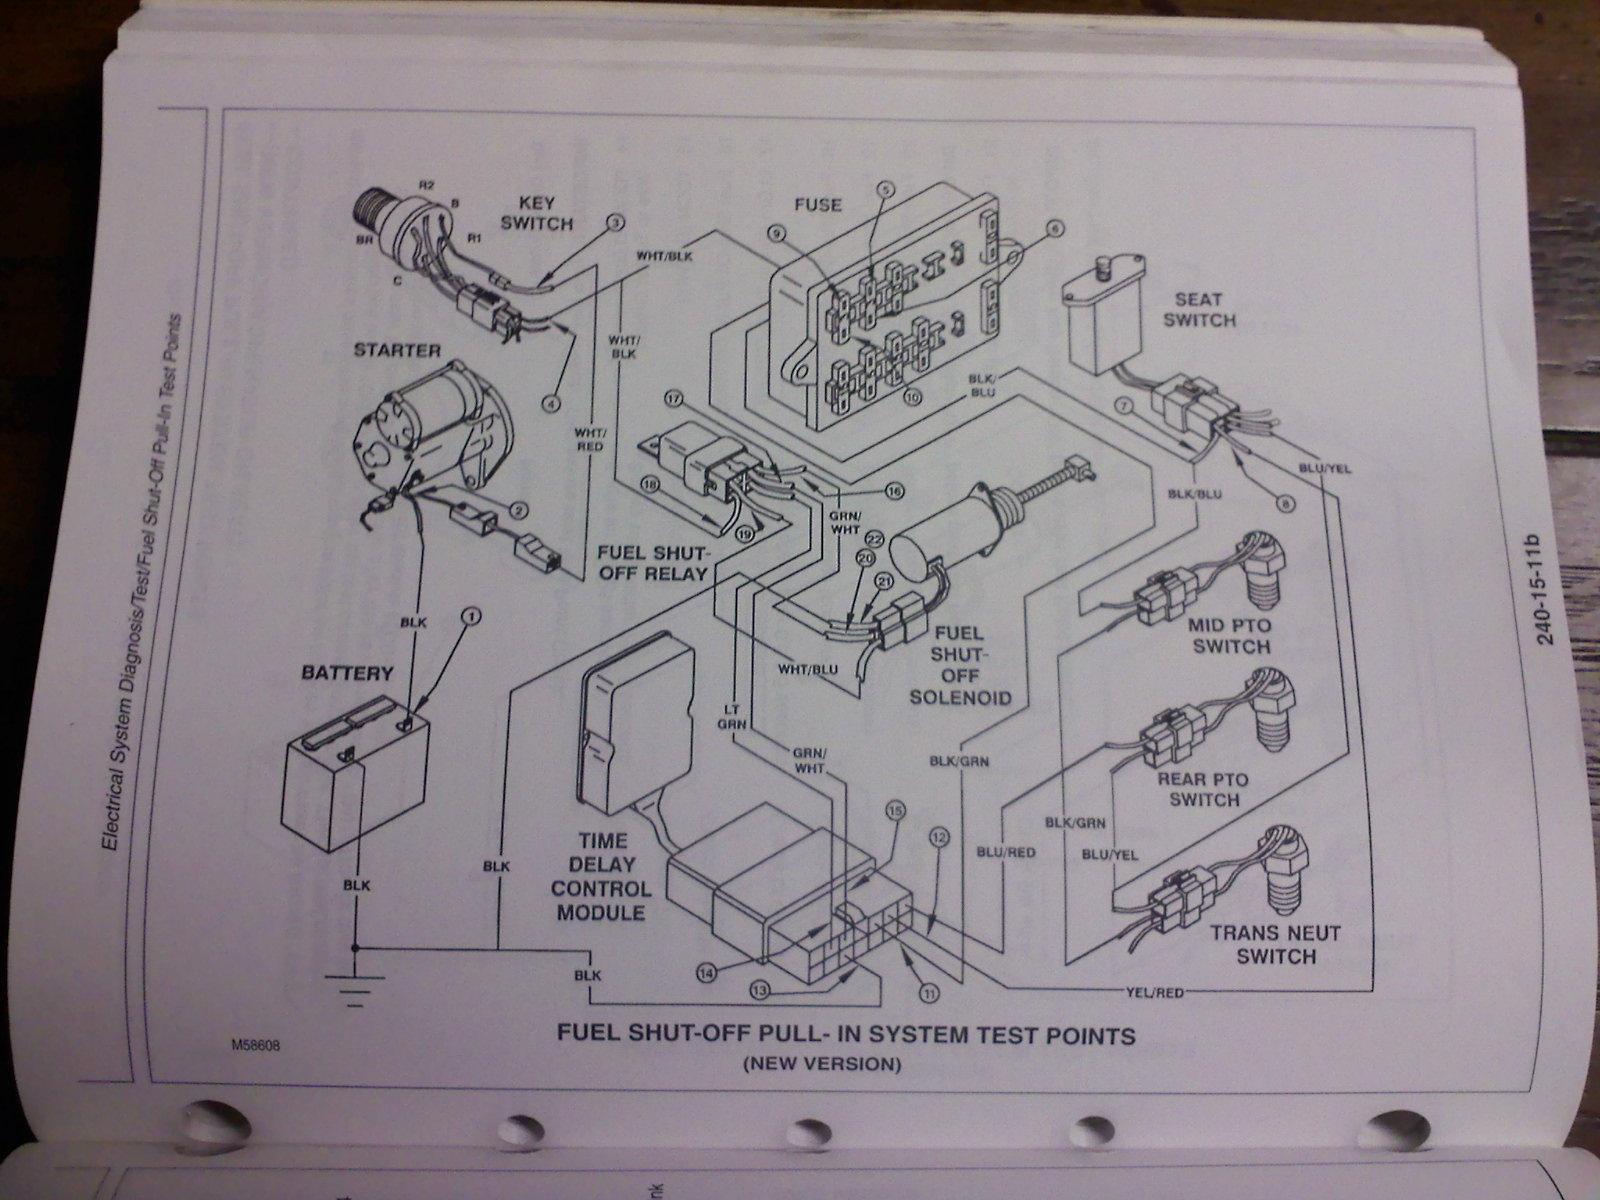 Fine 770 John Deere Fuse Box Wiring Library Wiring Cloud Lukepaidewilluminateatxorg